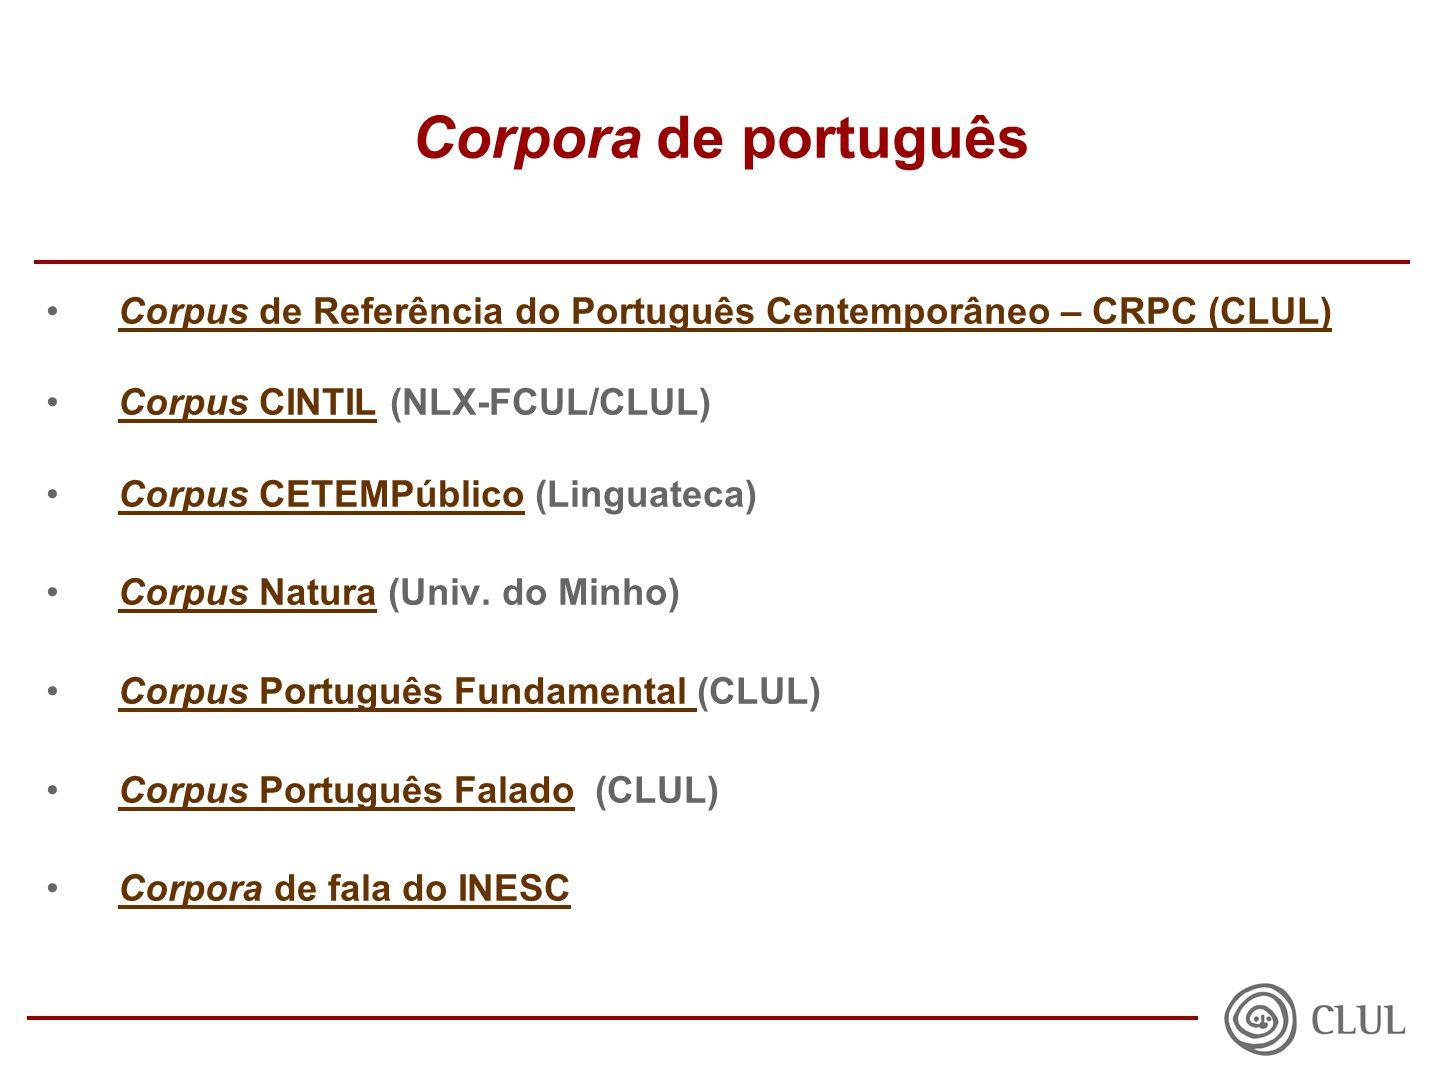 Corpora de português Corpus de Referência do Português Centemporâneo – CRPC (CLUL)Corpus de Referência do Português Centemporâneo – CRPC (CLUL) Corpus